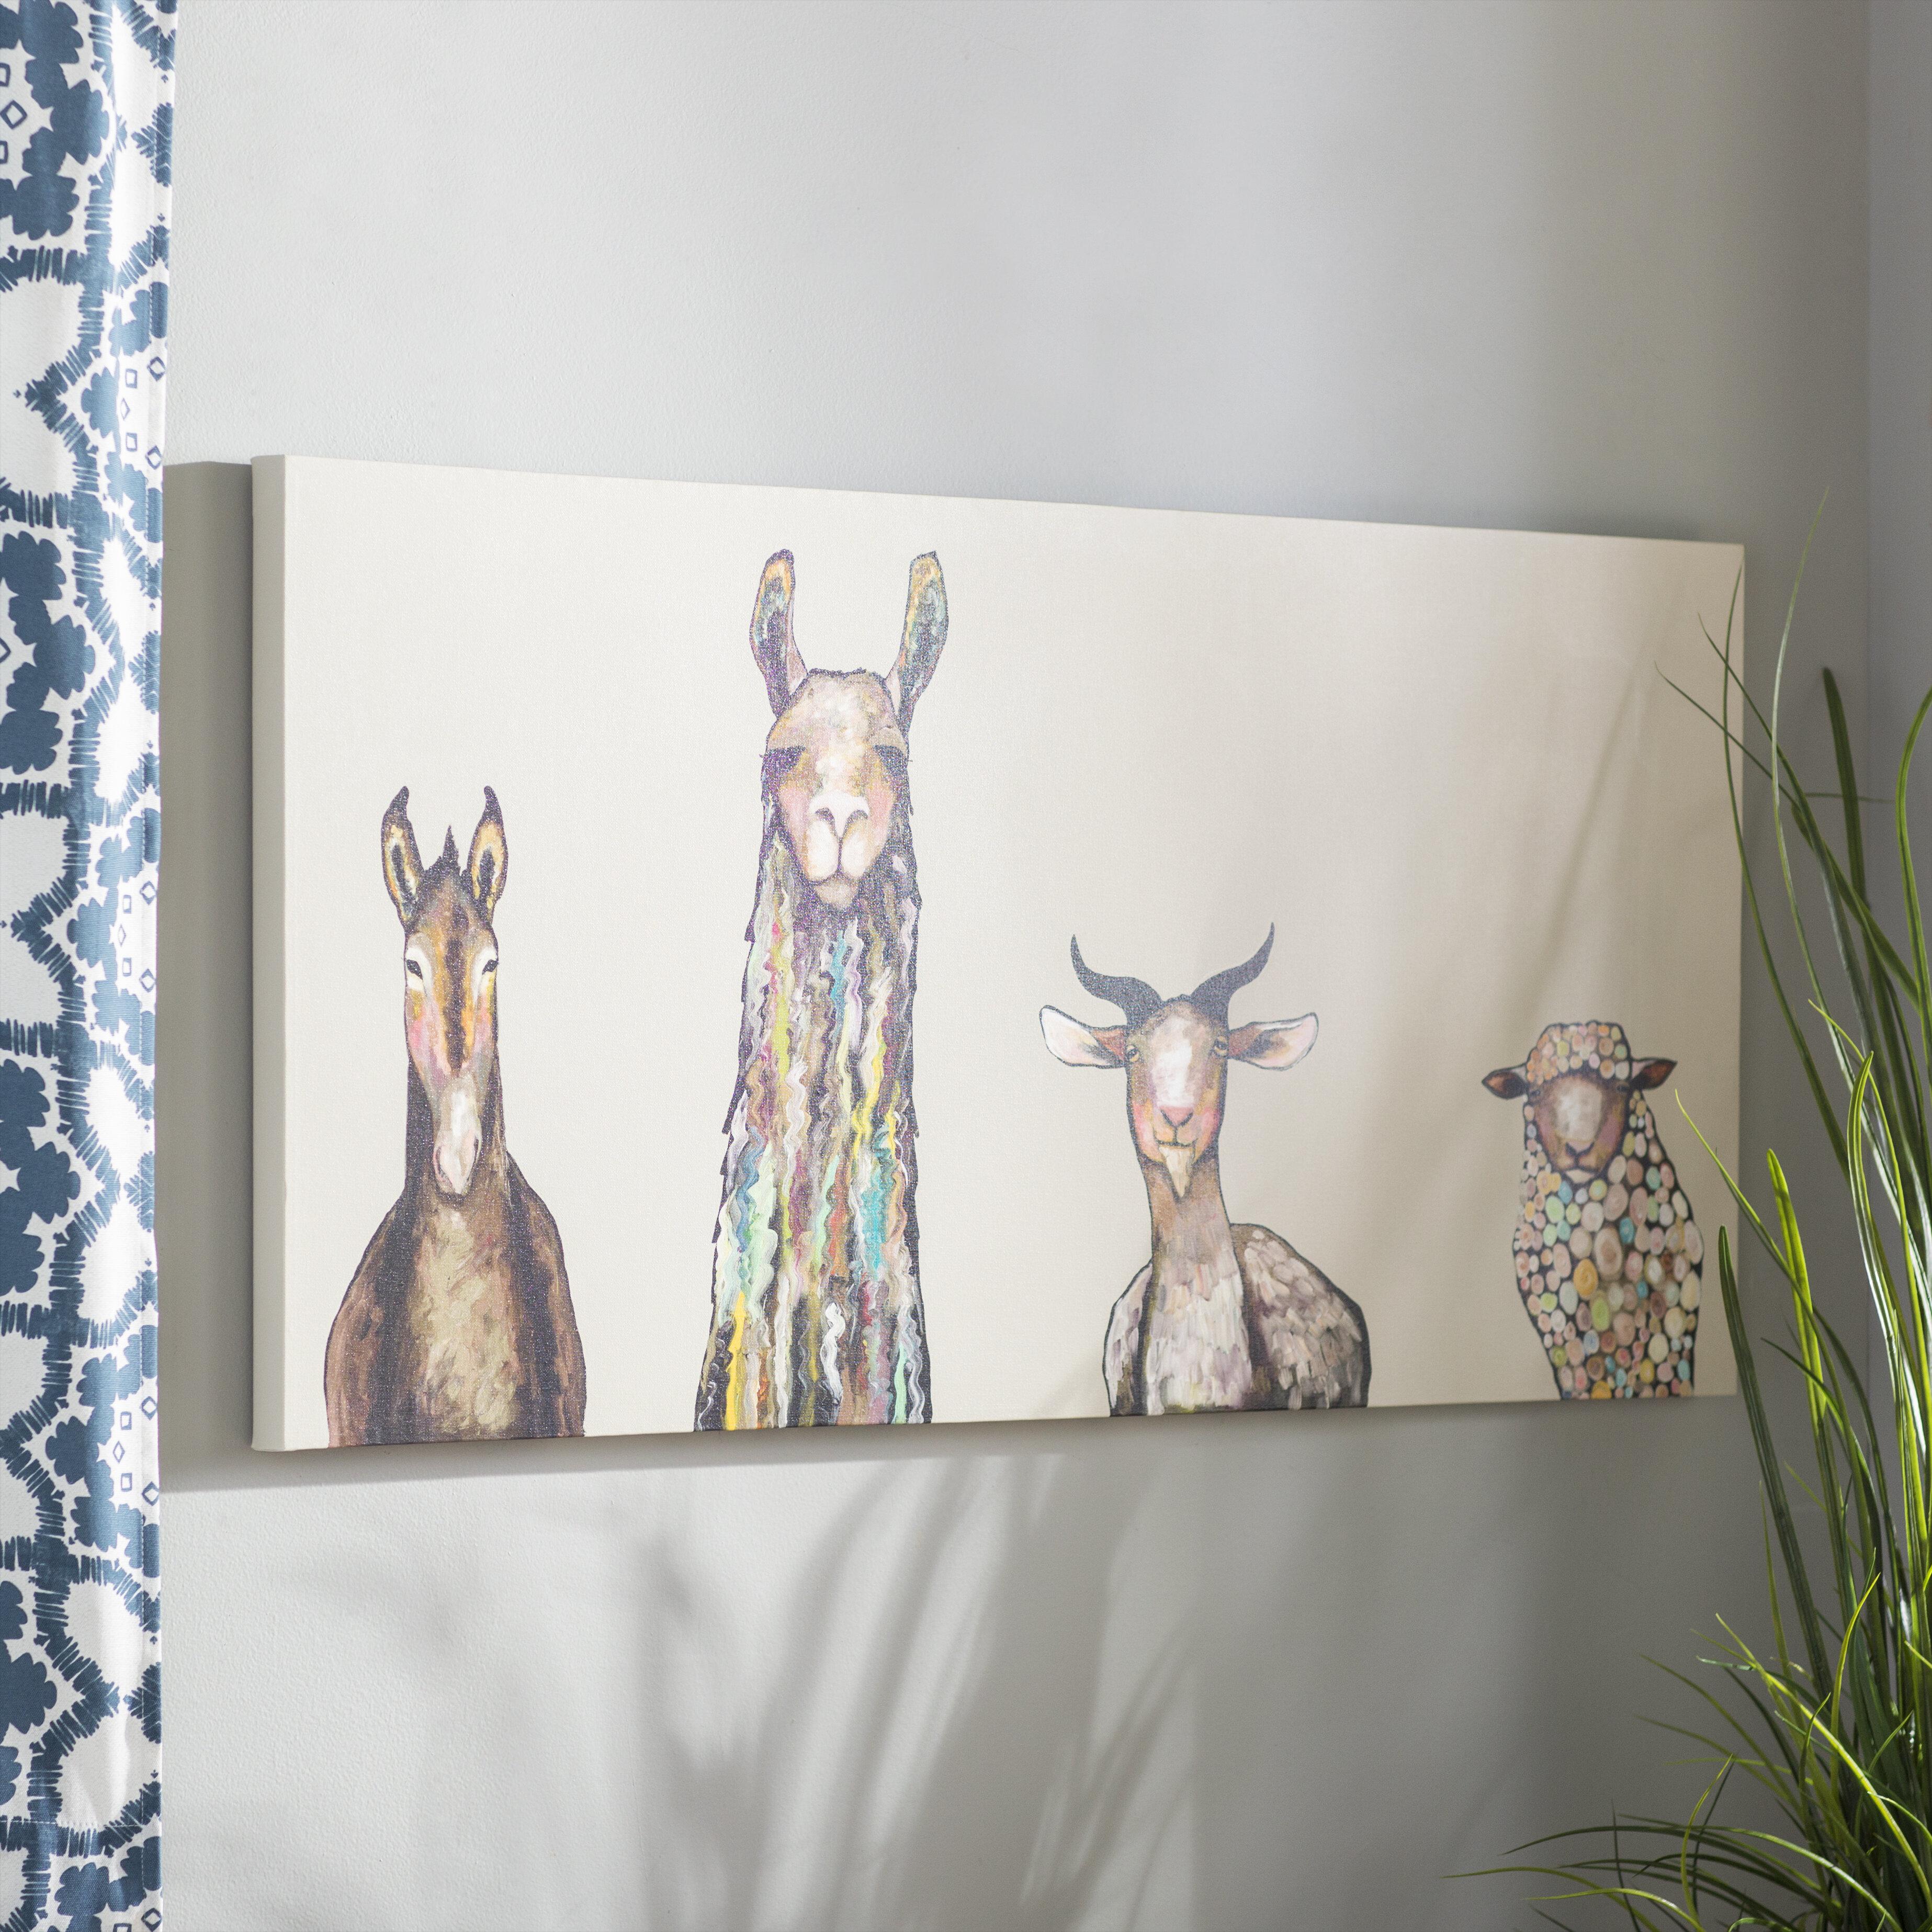 Mercury Row Donkey Llama Goat Sheep Acrylic Painting Print On Canvas In Cream Reviews